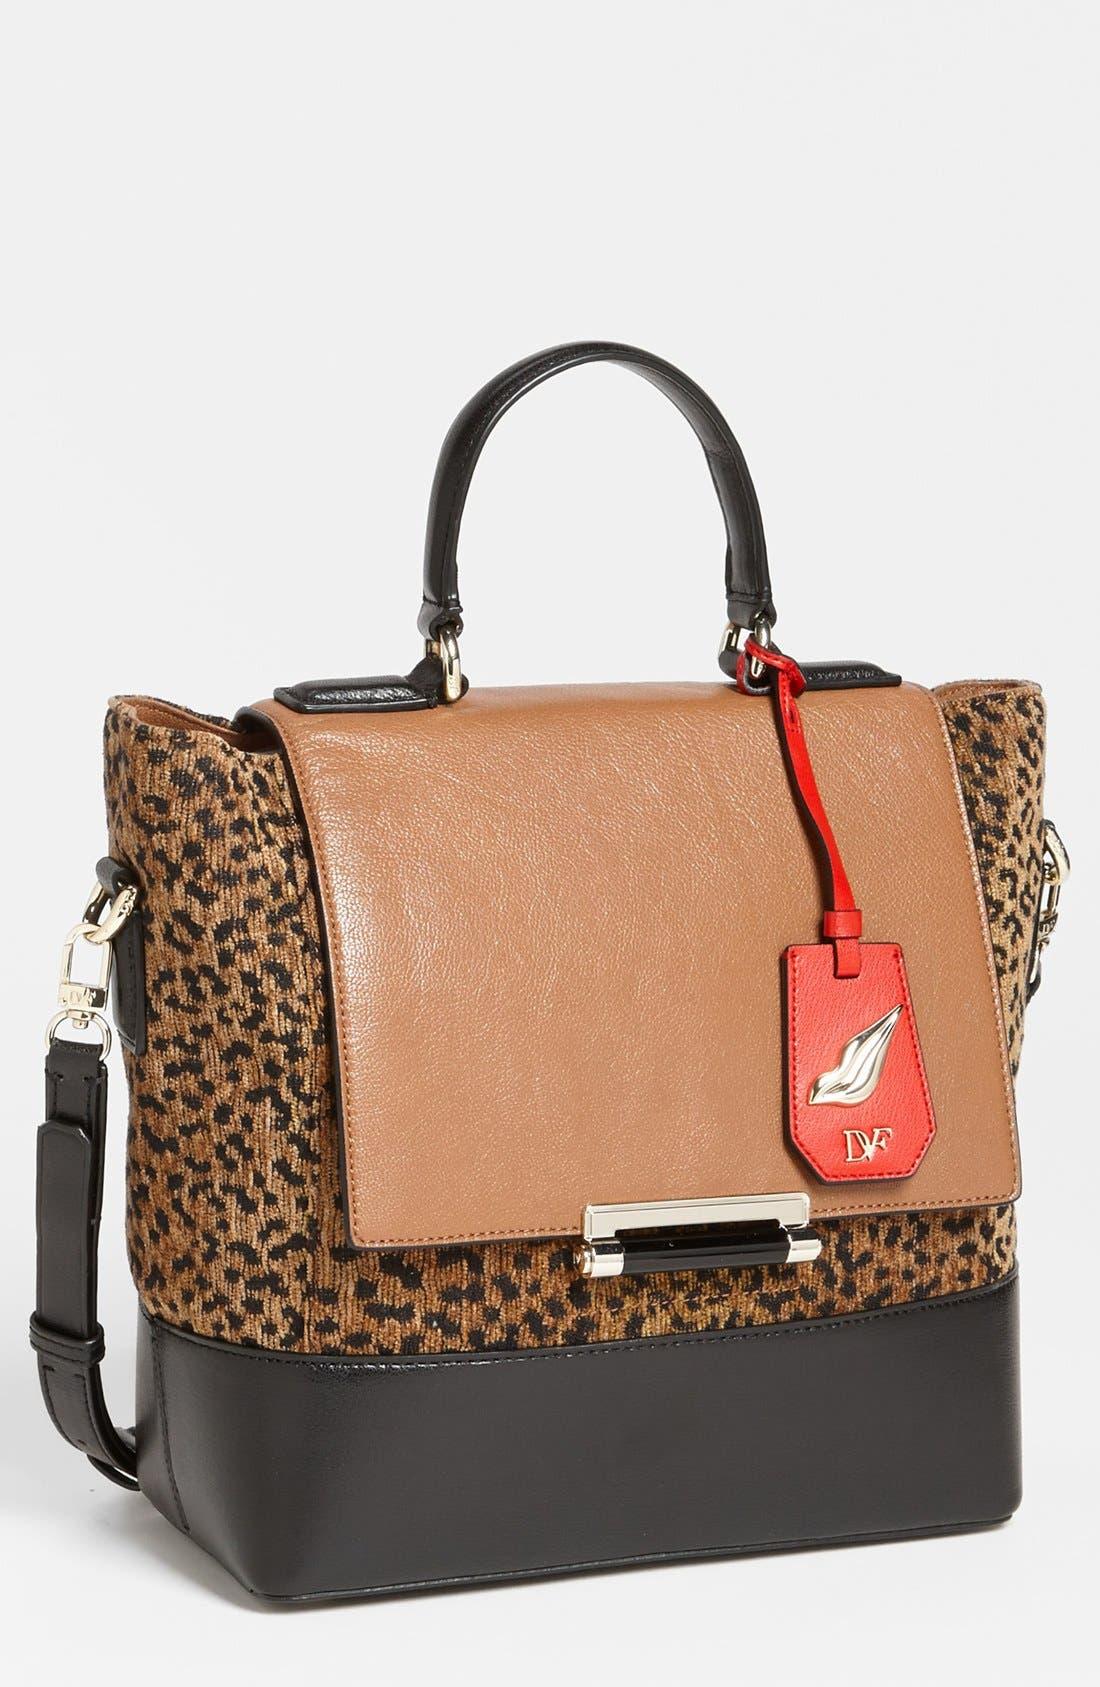 Main Image - Diane von Furstenberg '440 Top Handle - Small' Leopard Jacquard Satchel